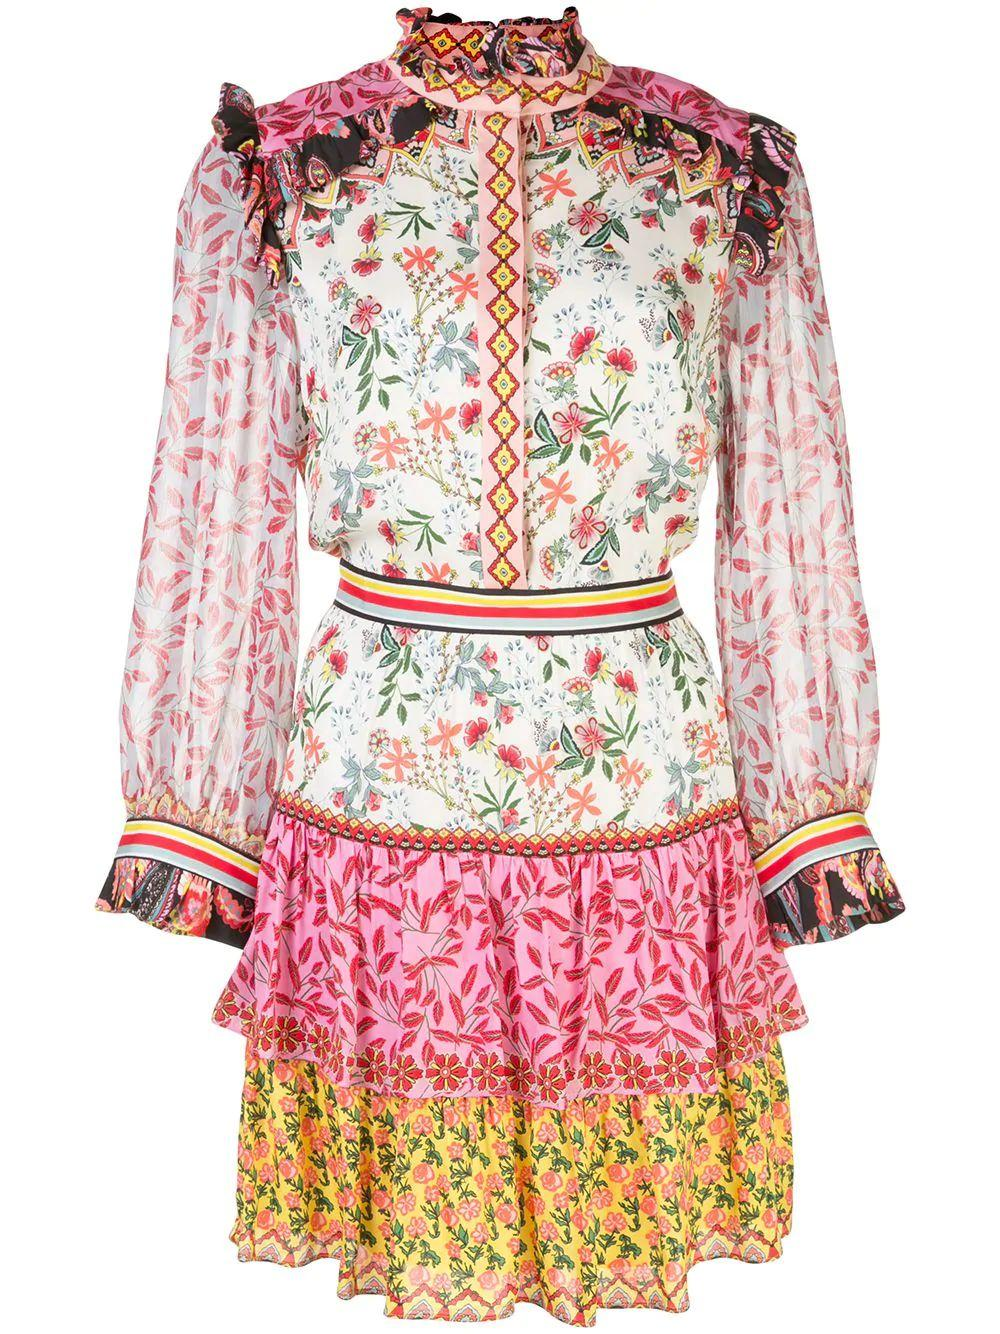 Kathy Button Down Tiered Dress Item # CC003P61509-C